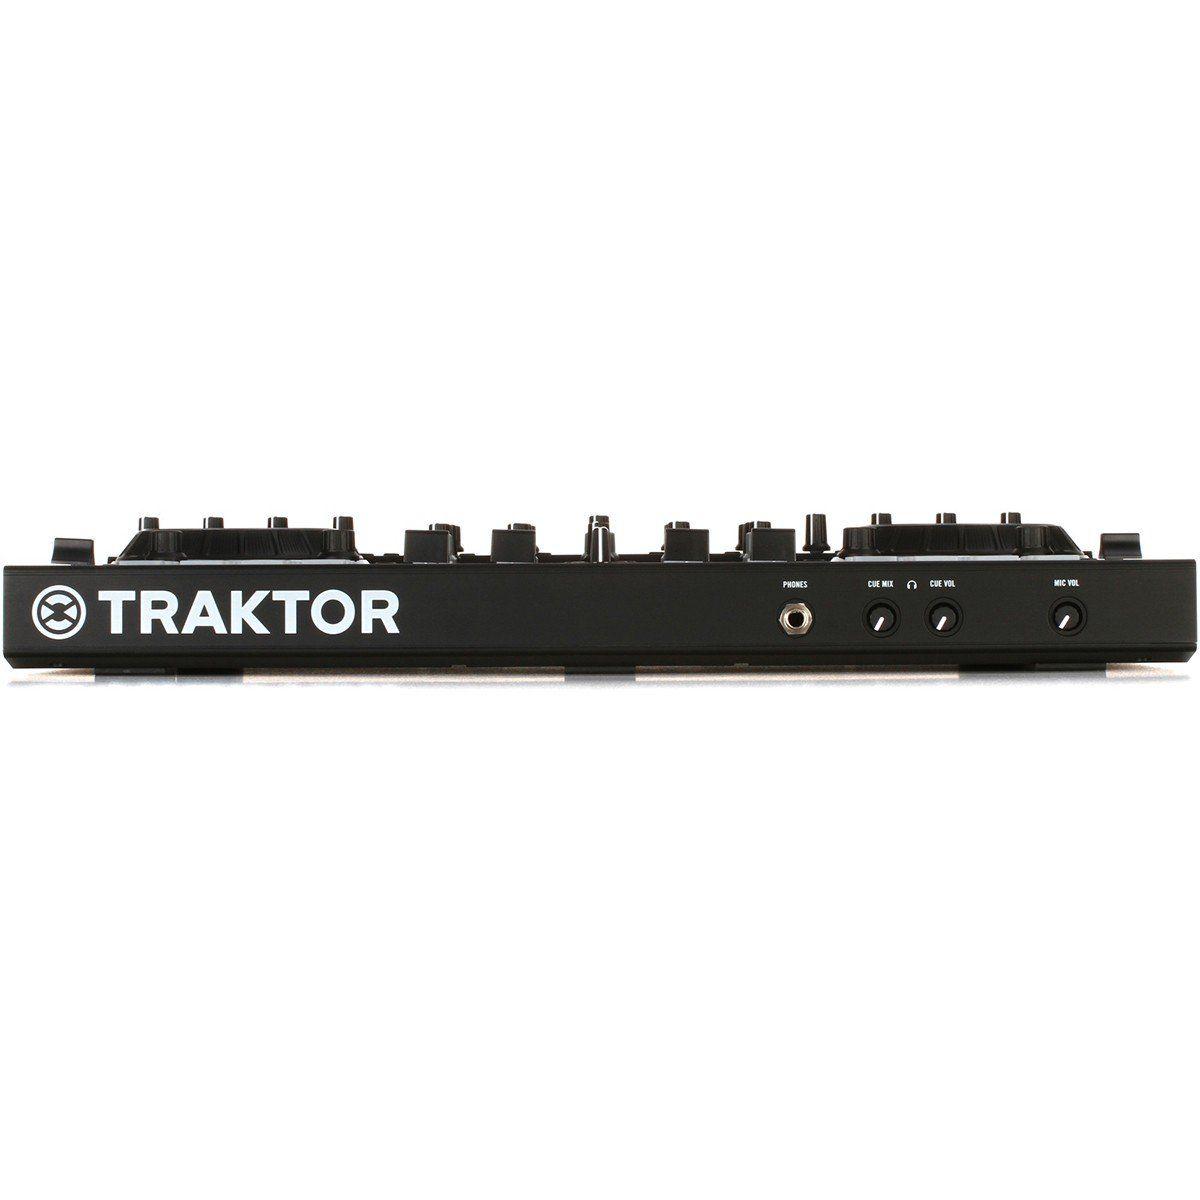 Native Instruments Traktor Kontrol S4 MKII Controladora Dj 4-Decks 4-Canais